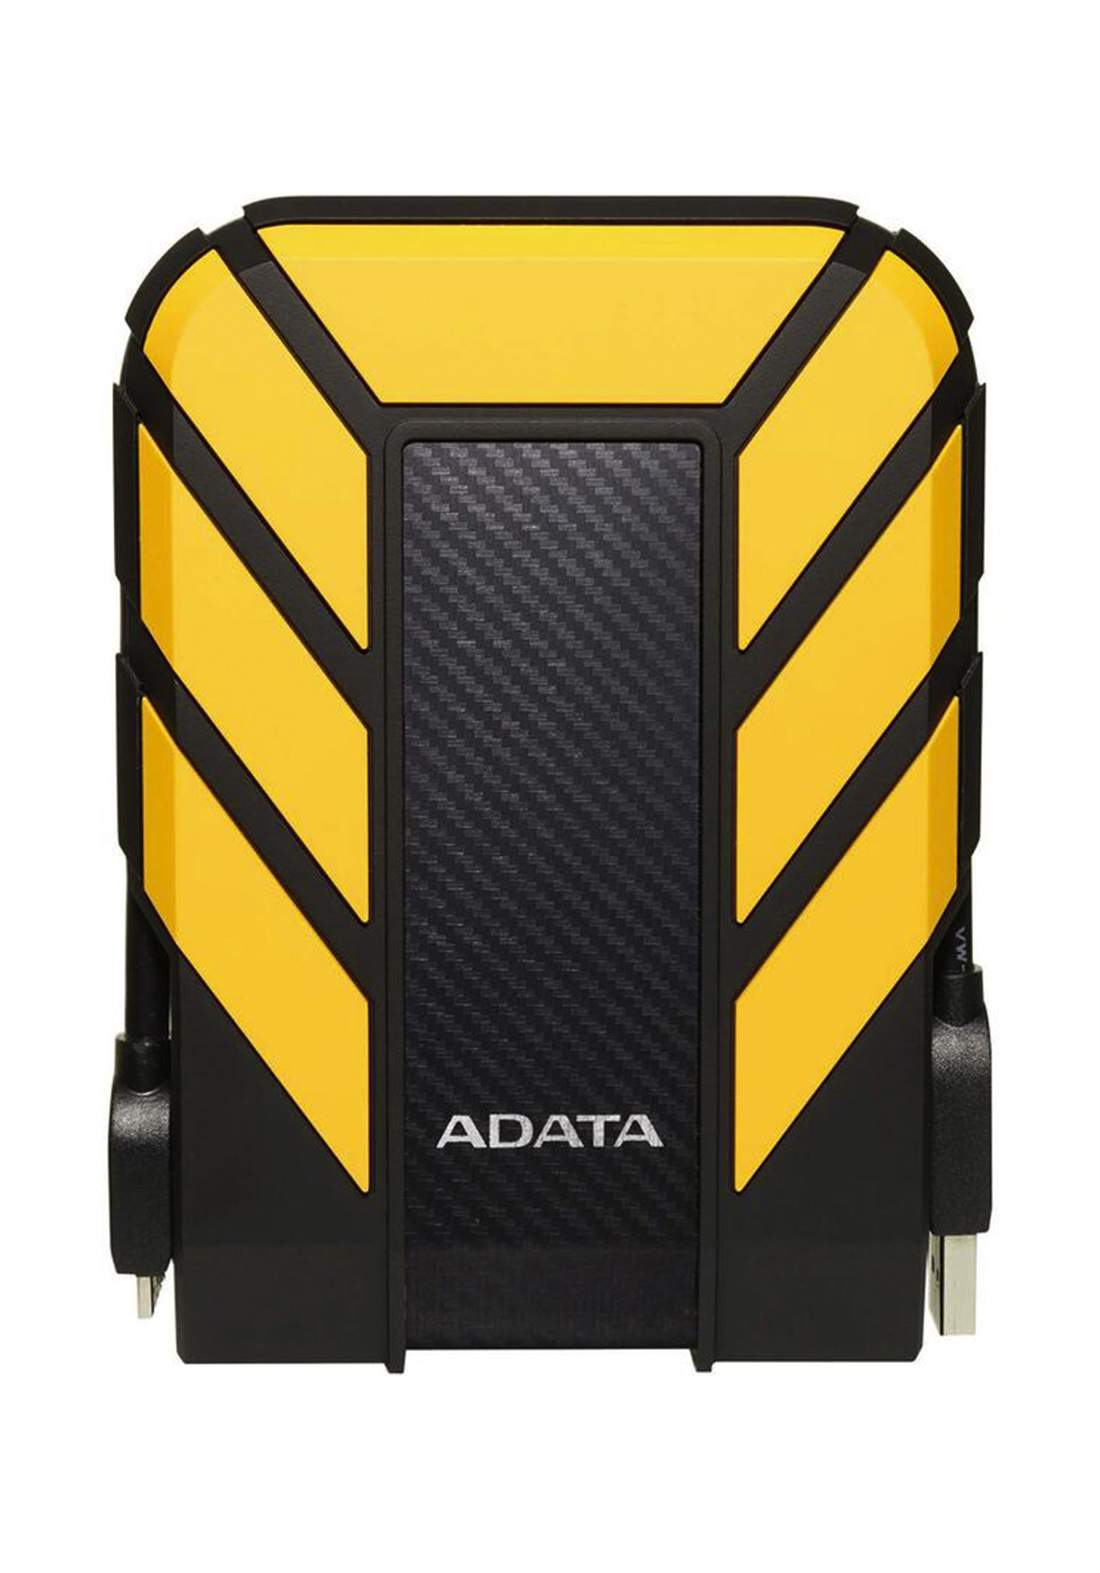 Adata HD710 Pro 1TB USB 3.1 External Hard Drive - Yellow هارد خارجي